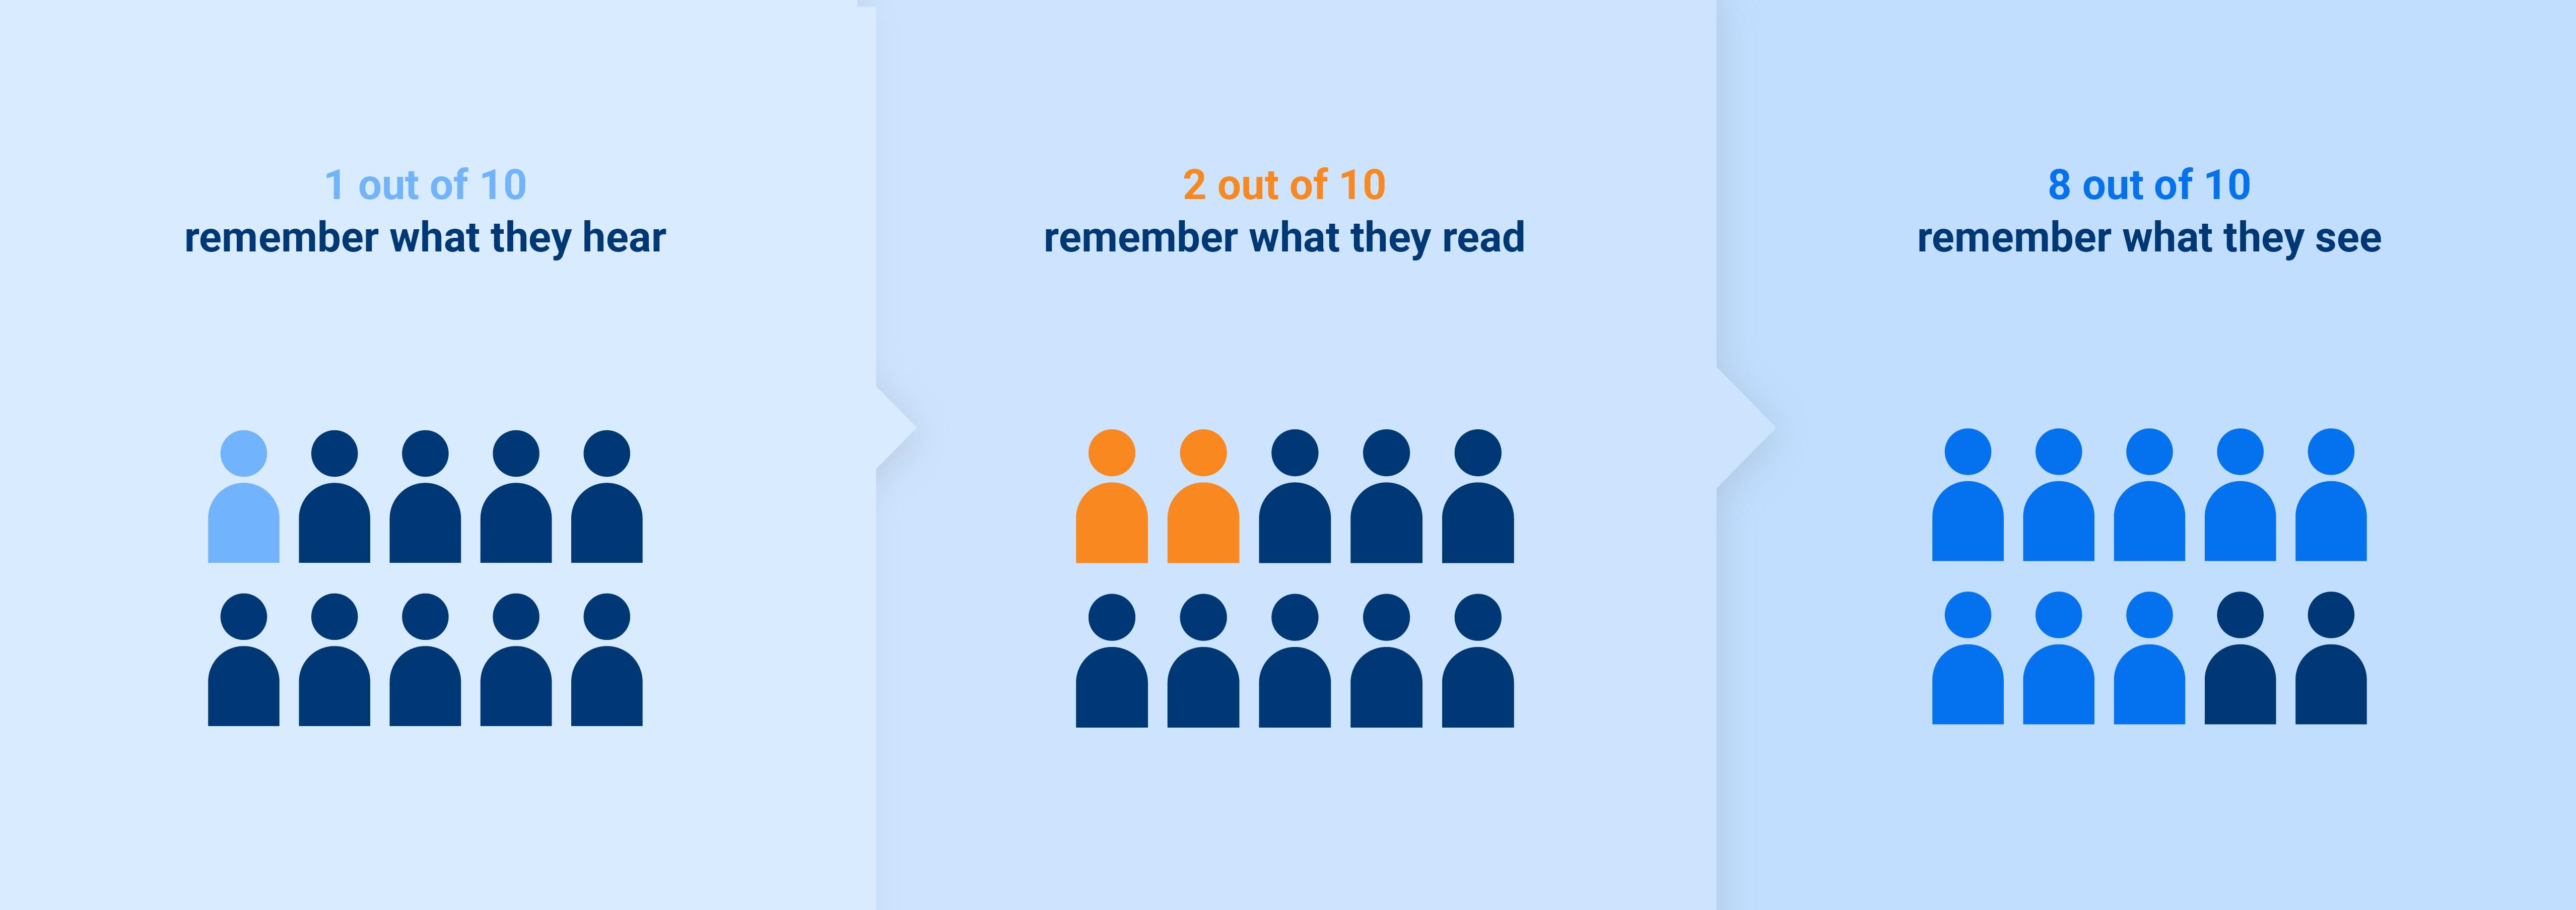 Blog_Image2_Branding_Infographics_MAR2021